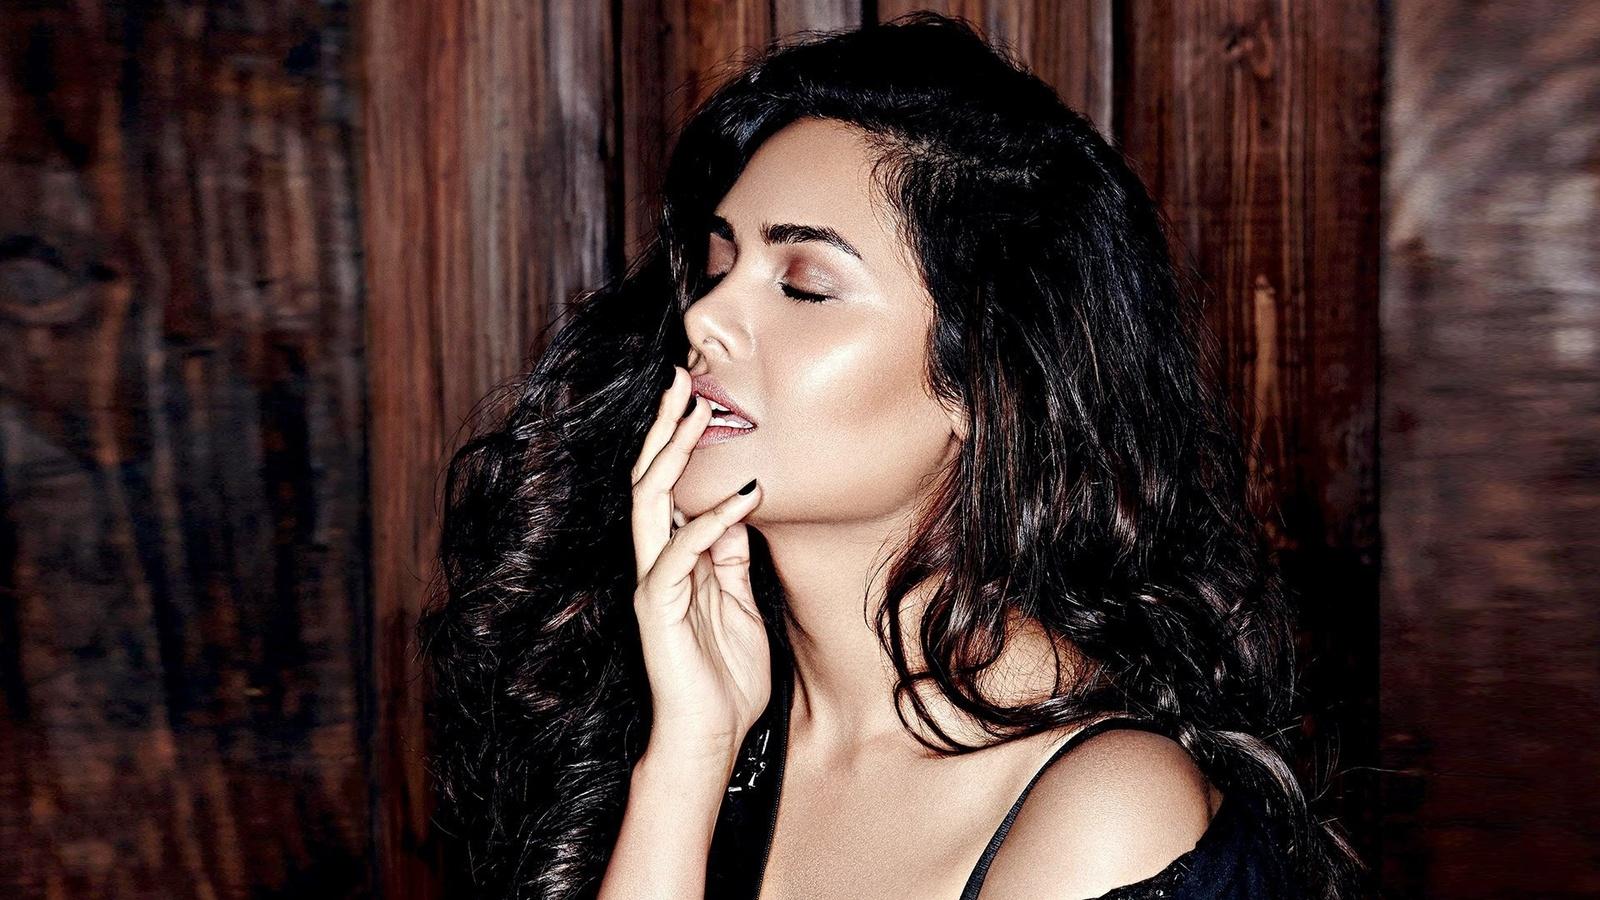 girl, eyes, brunette, девушка, actress, esha gupta, актриса, celebrity, bollywood, beauty, индийский, model, indian, красавица, lips, beautiful